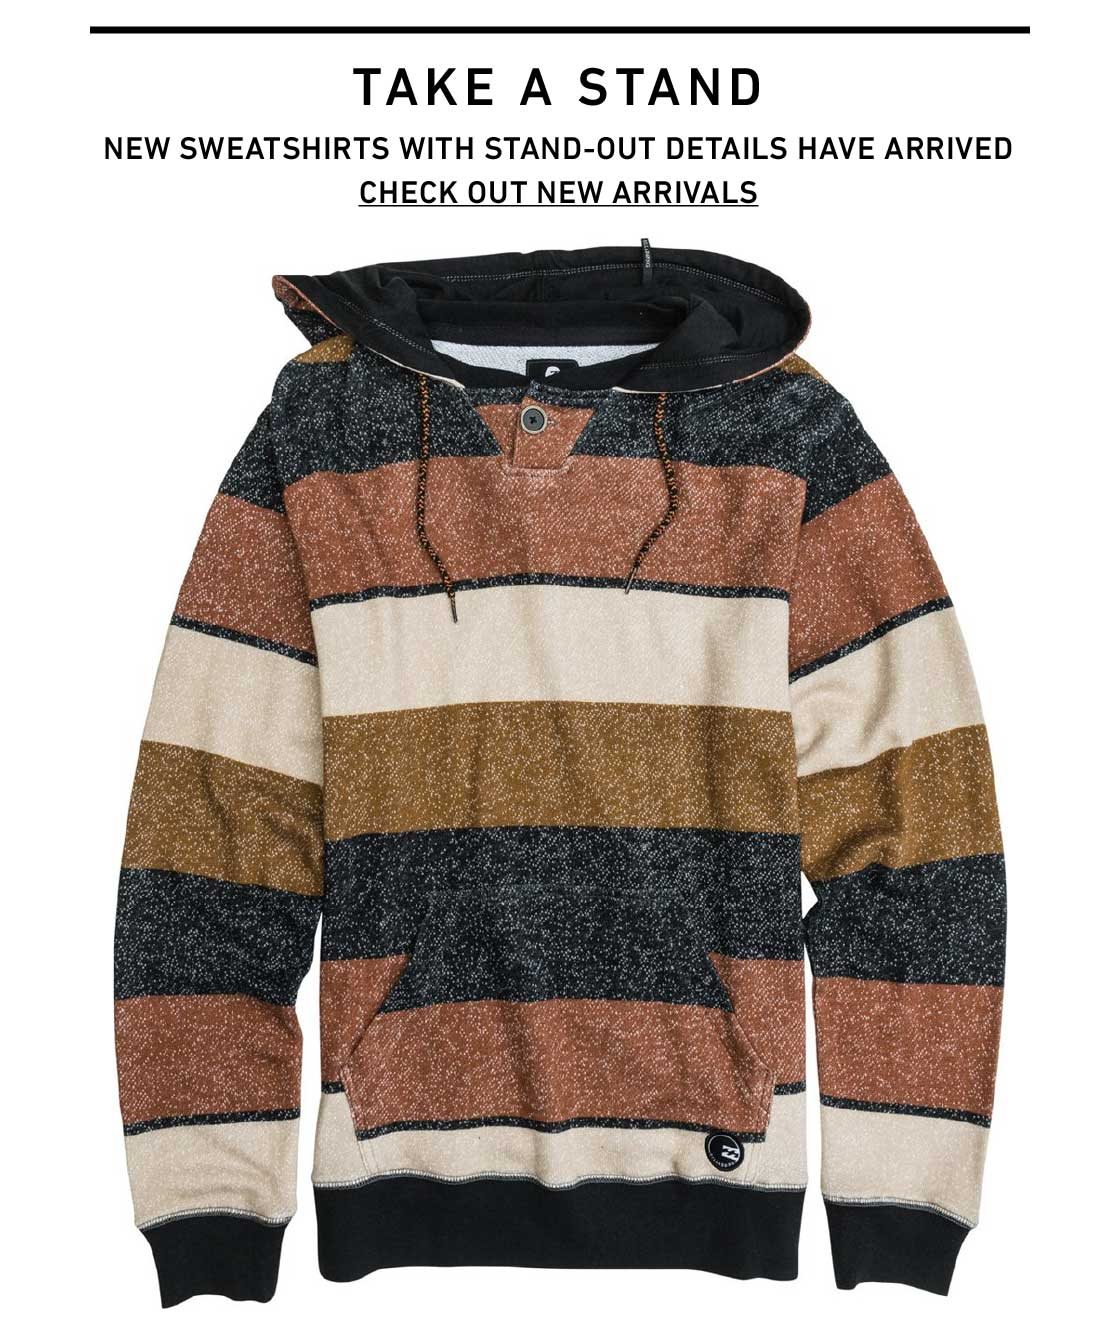 Shop New Sweatshirts